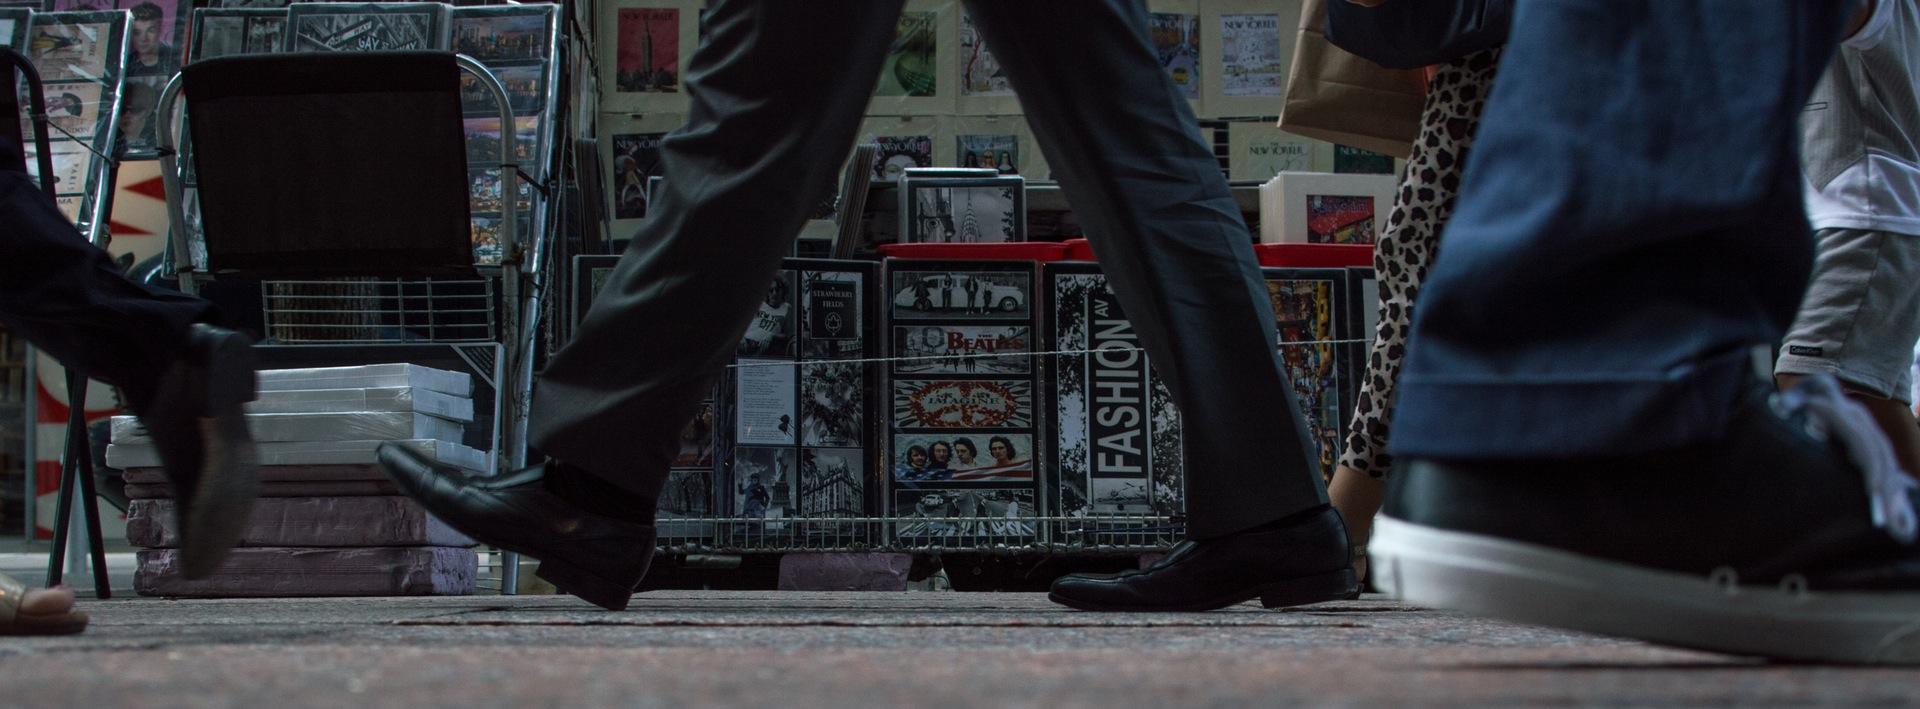 moda, gente, pies, piernas, calle, zapatos, negocios - Fondos de Pantalla HD - professor-falken.com